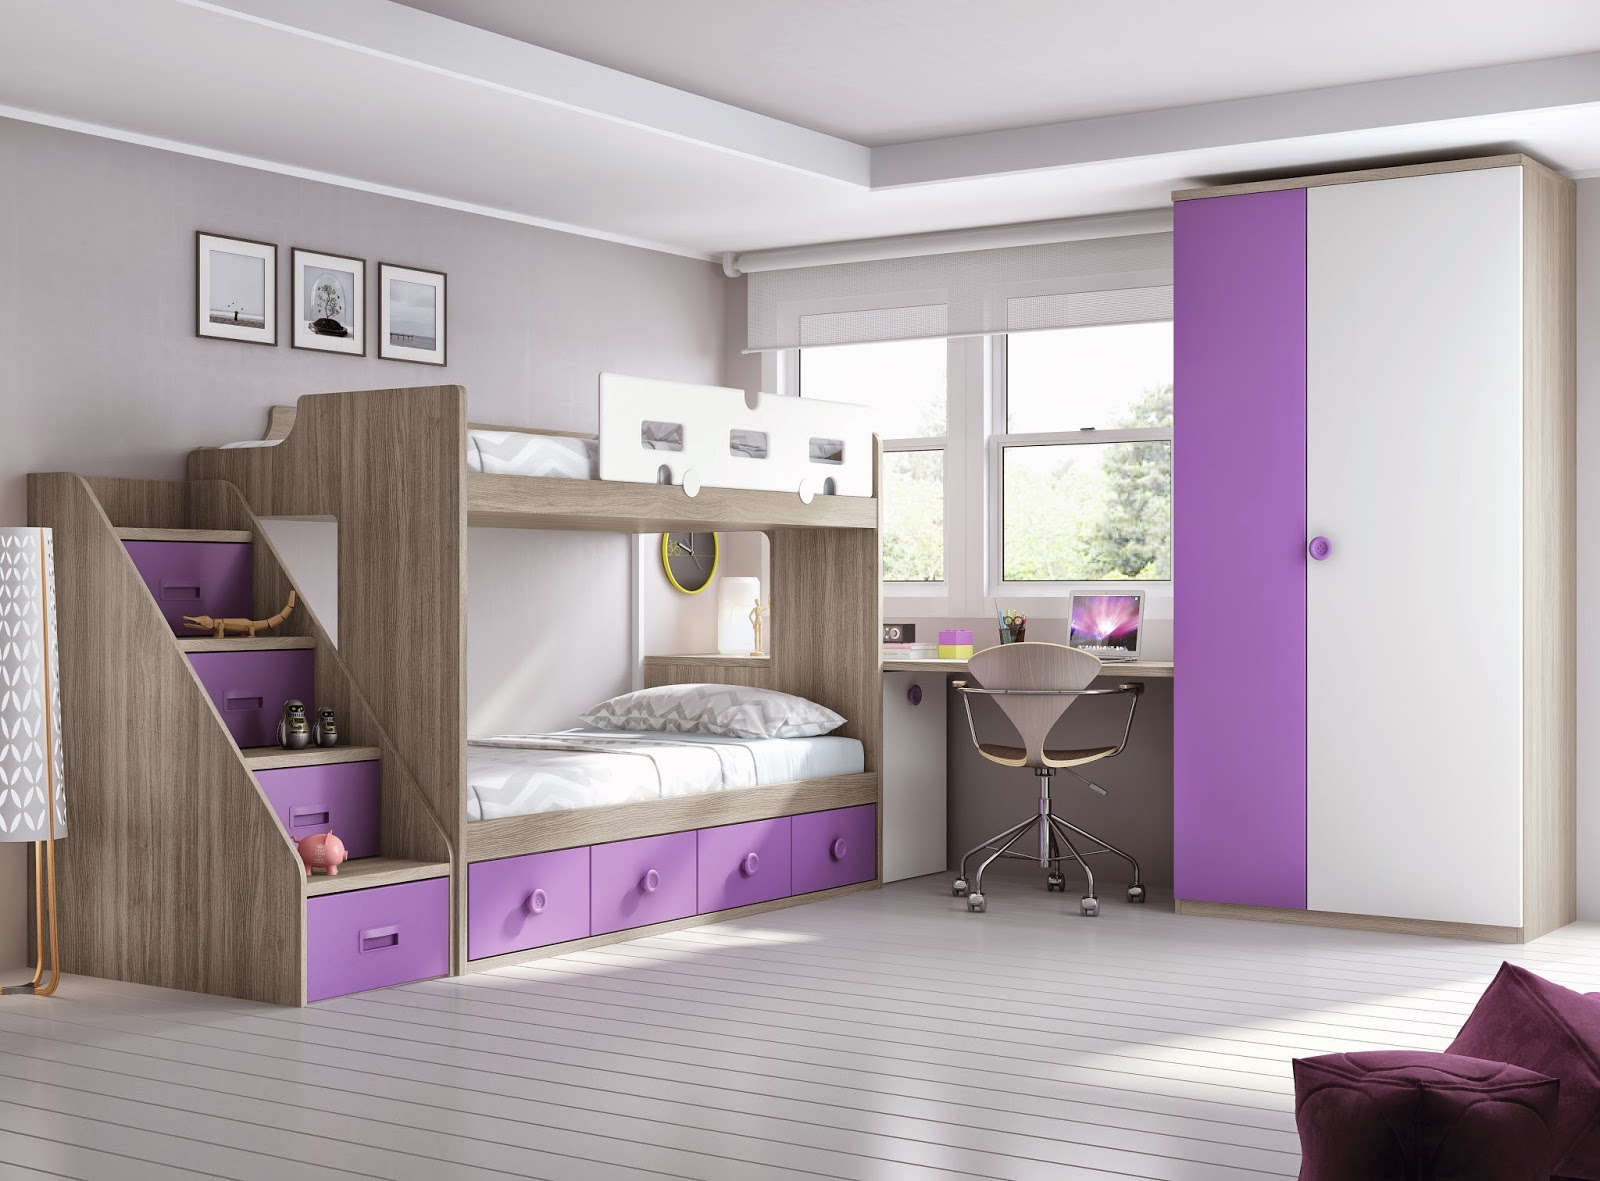 Litera juvenil 605fm15264 muebles dormitorios juveniles for Dormitorios juveniles online